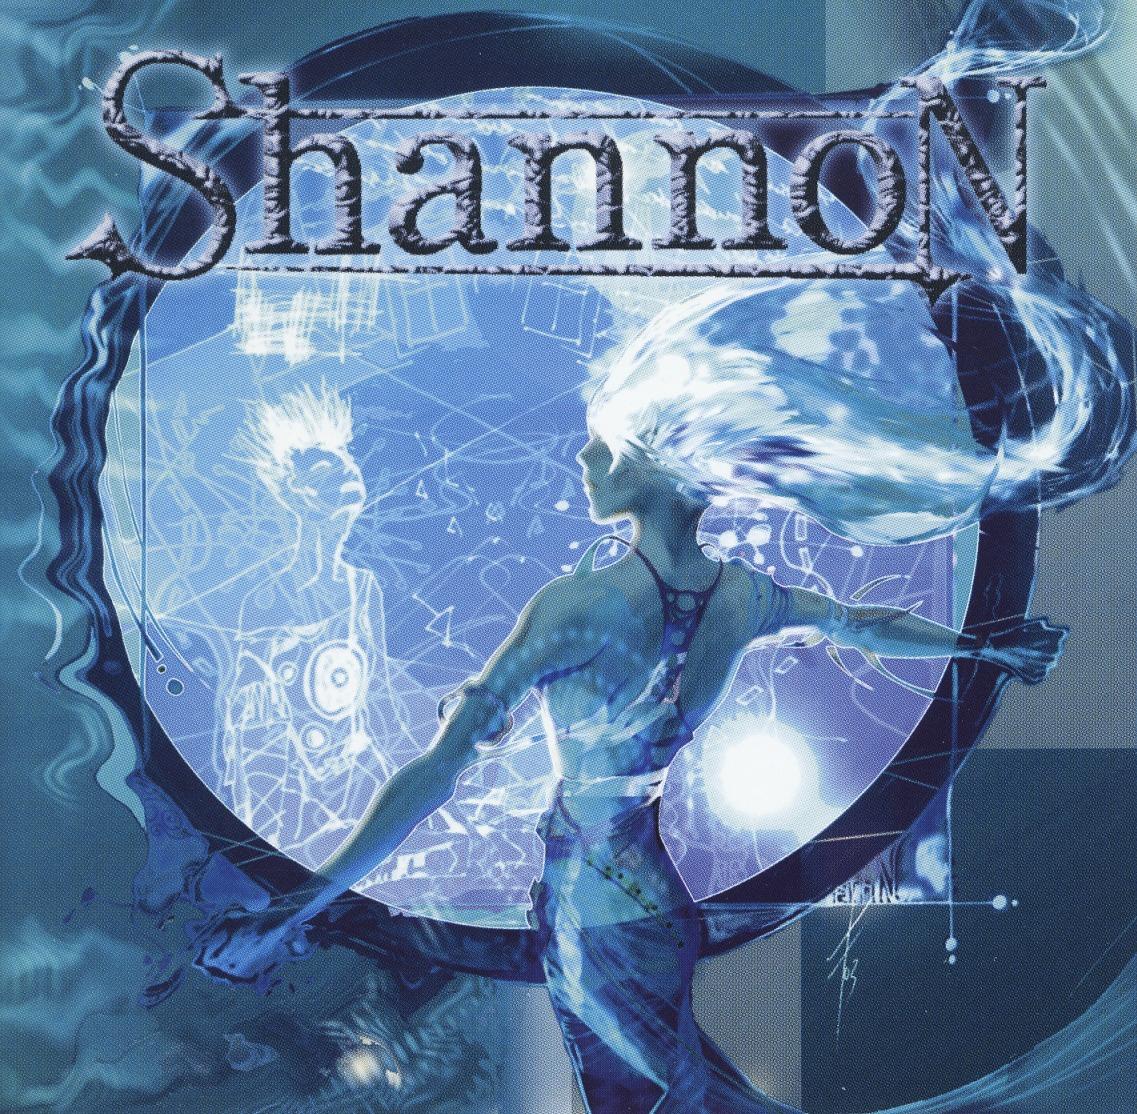 SHANNON (France) / Shannon